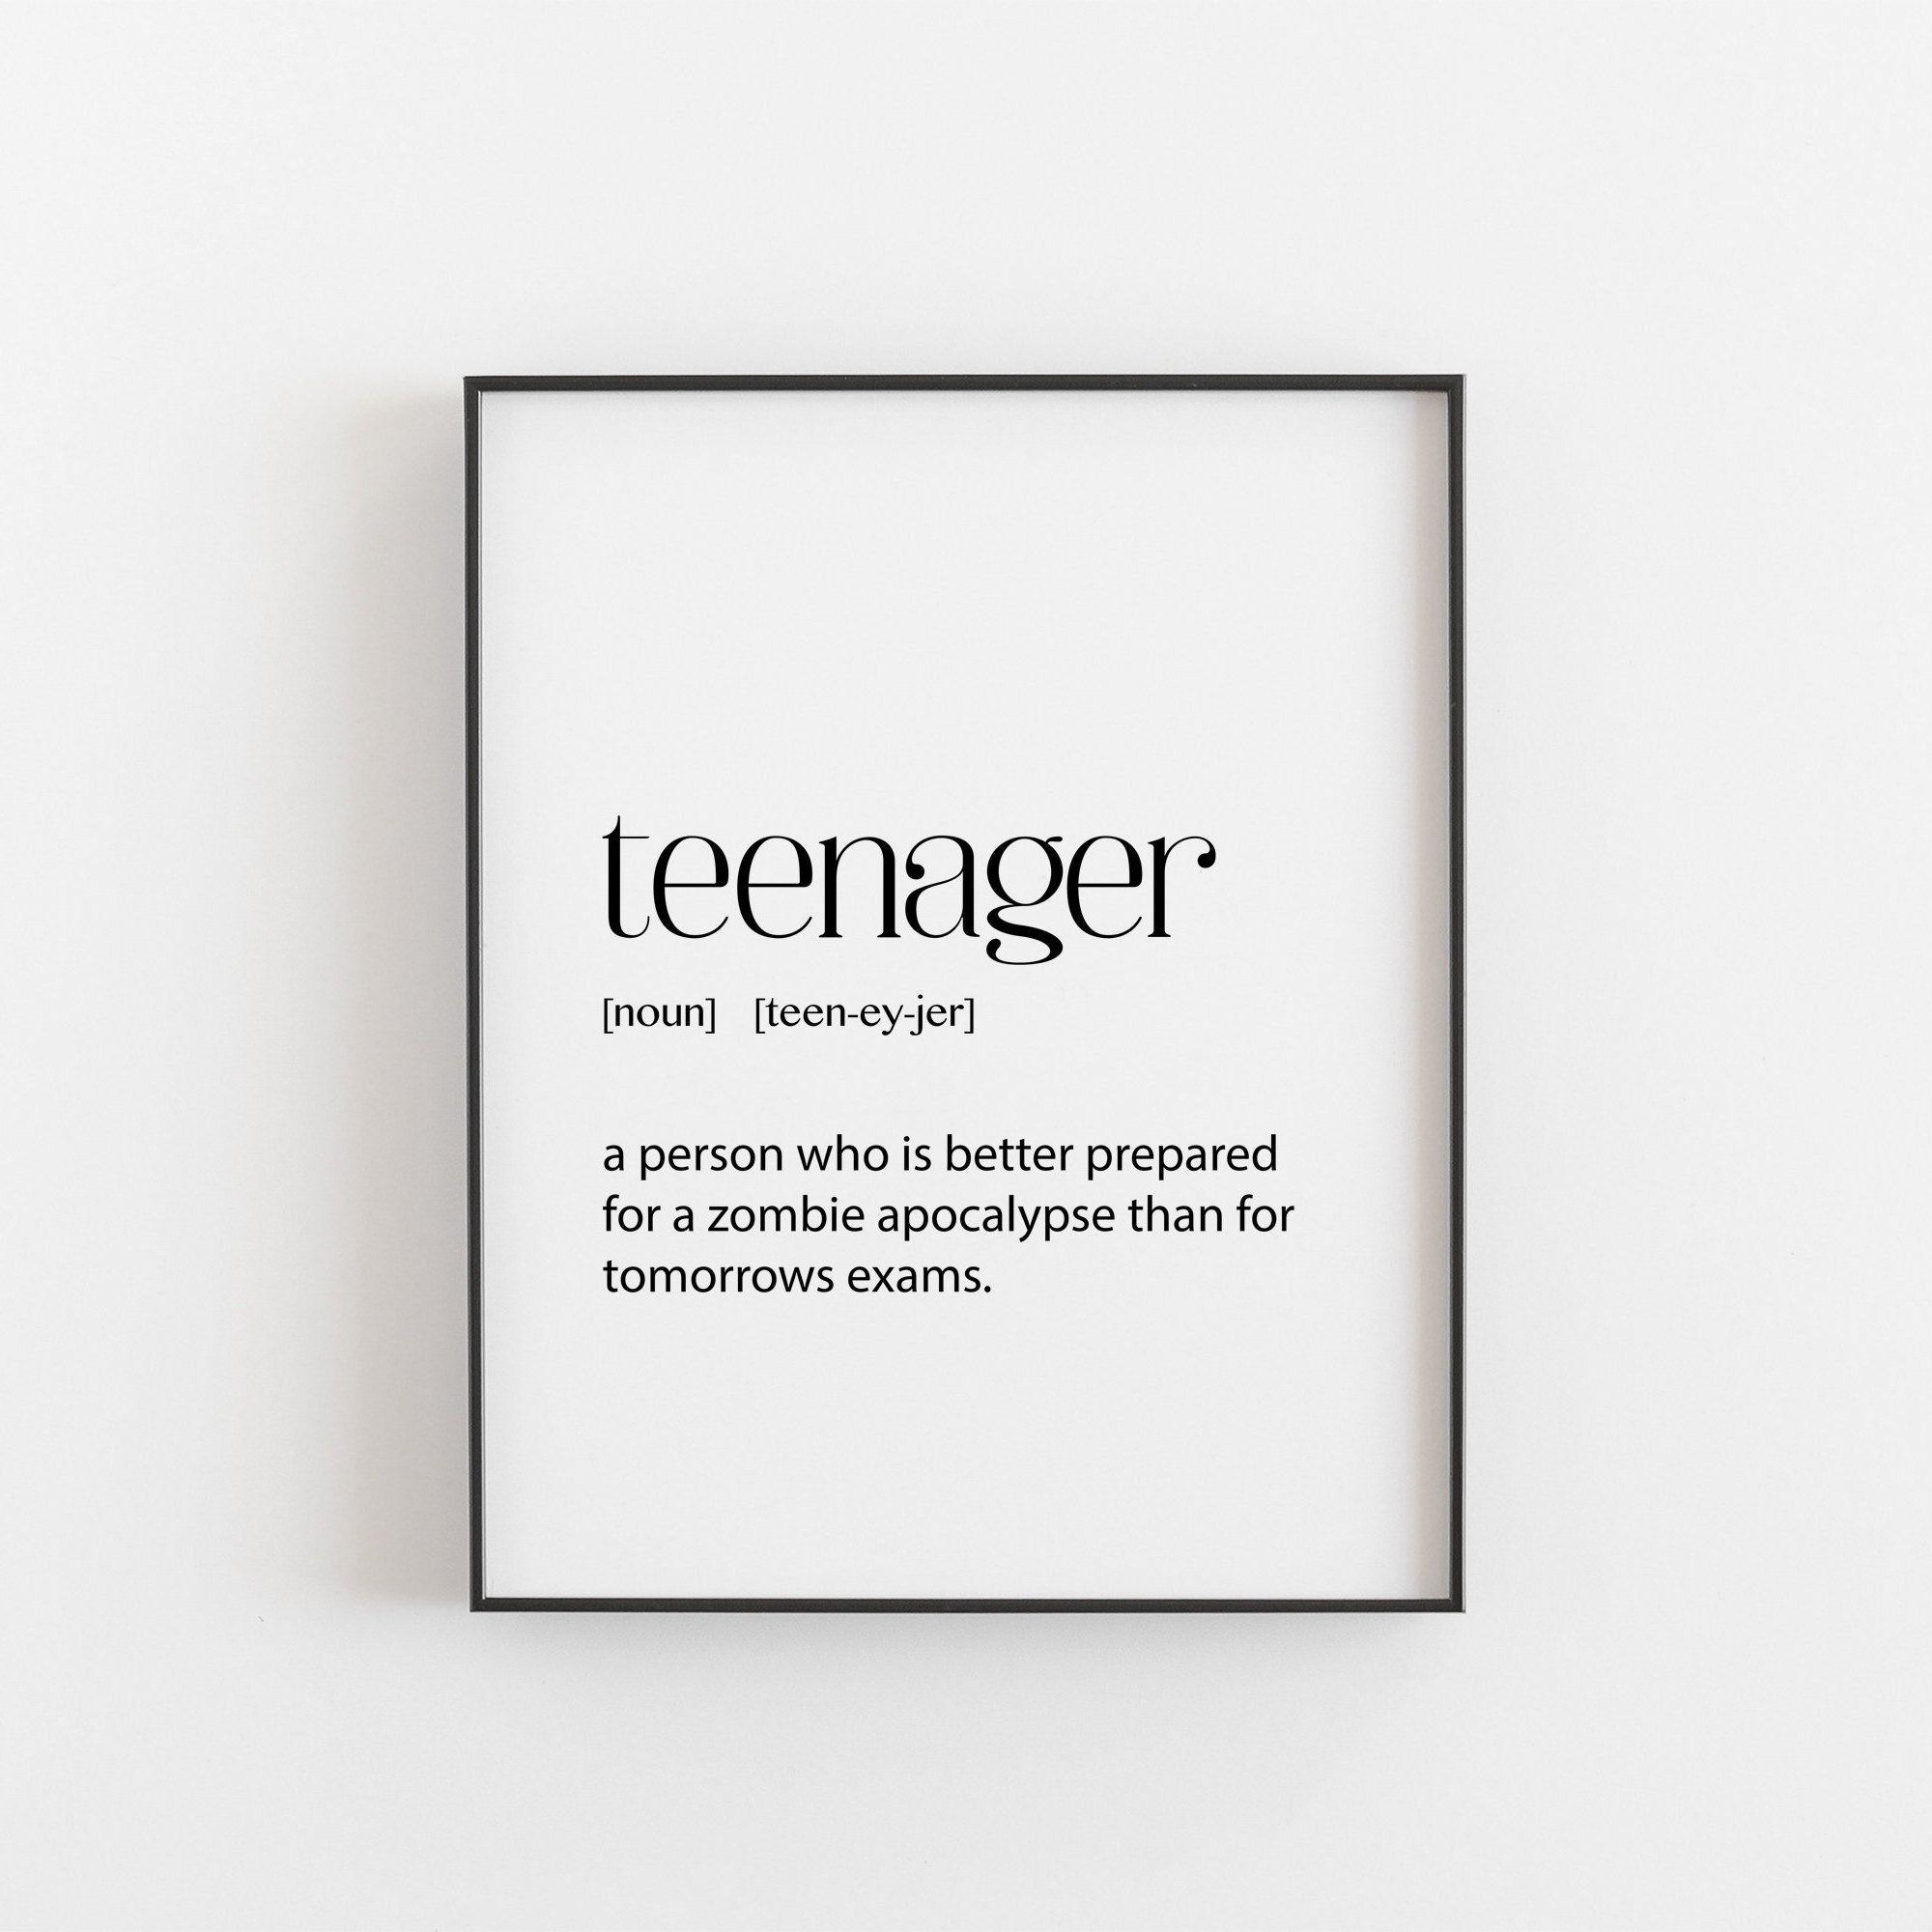 Teen Room Decor, Teenager Definition, Teen Bedroom Decor, Teen Boy Room Decor, Teen Girl Room Decor, Room Decor for Teen Boys, Cool Poster